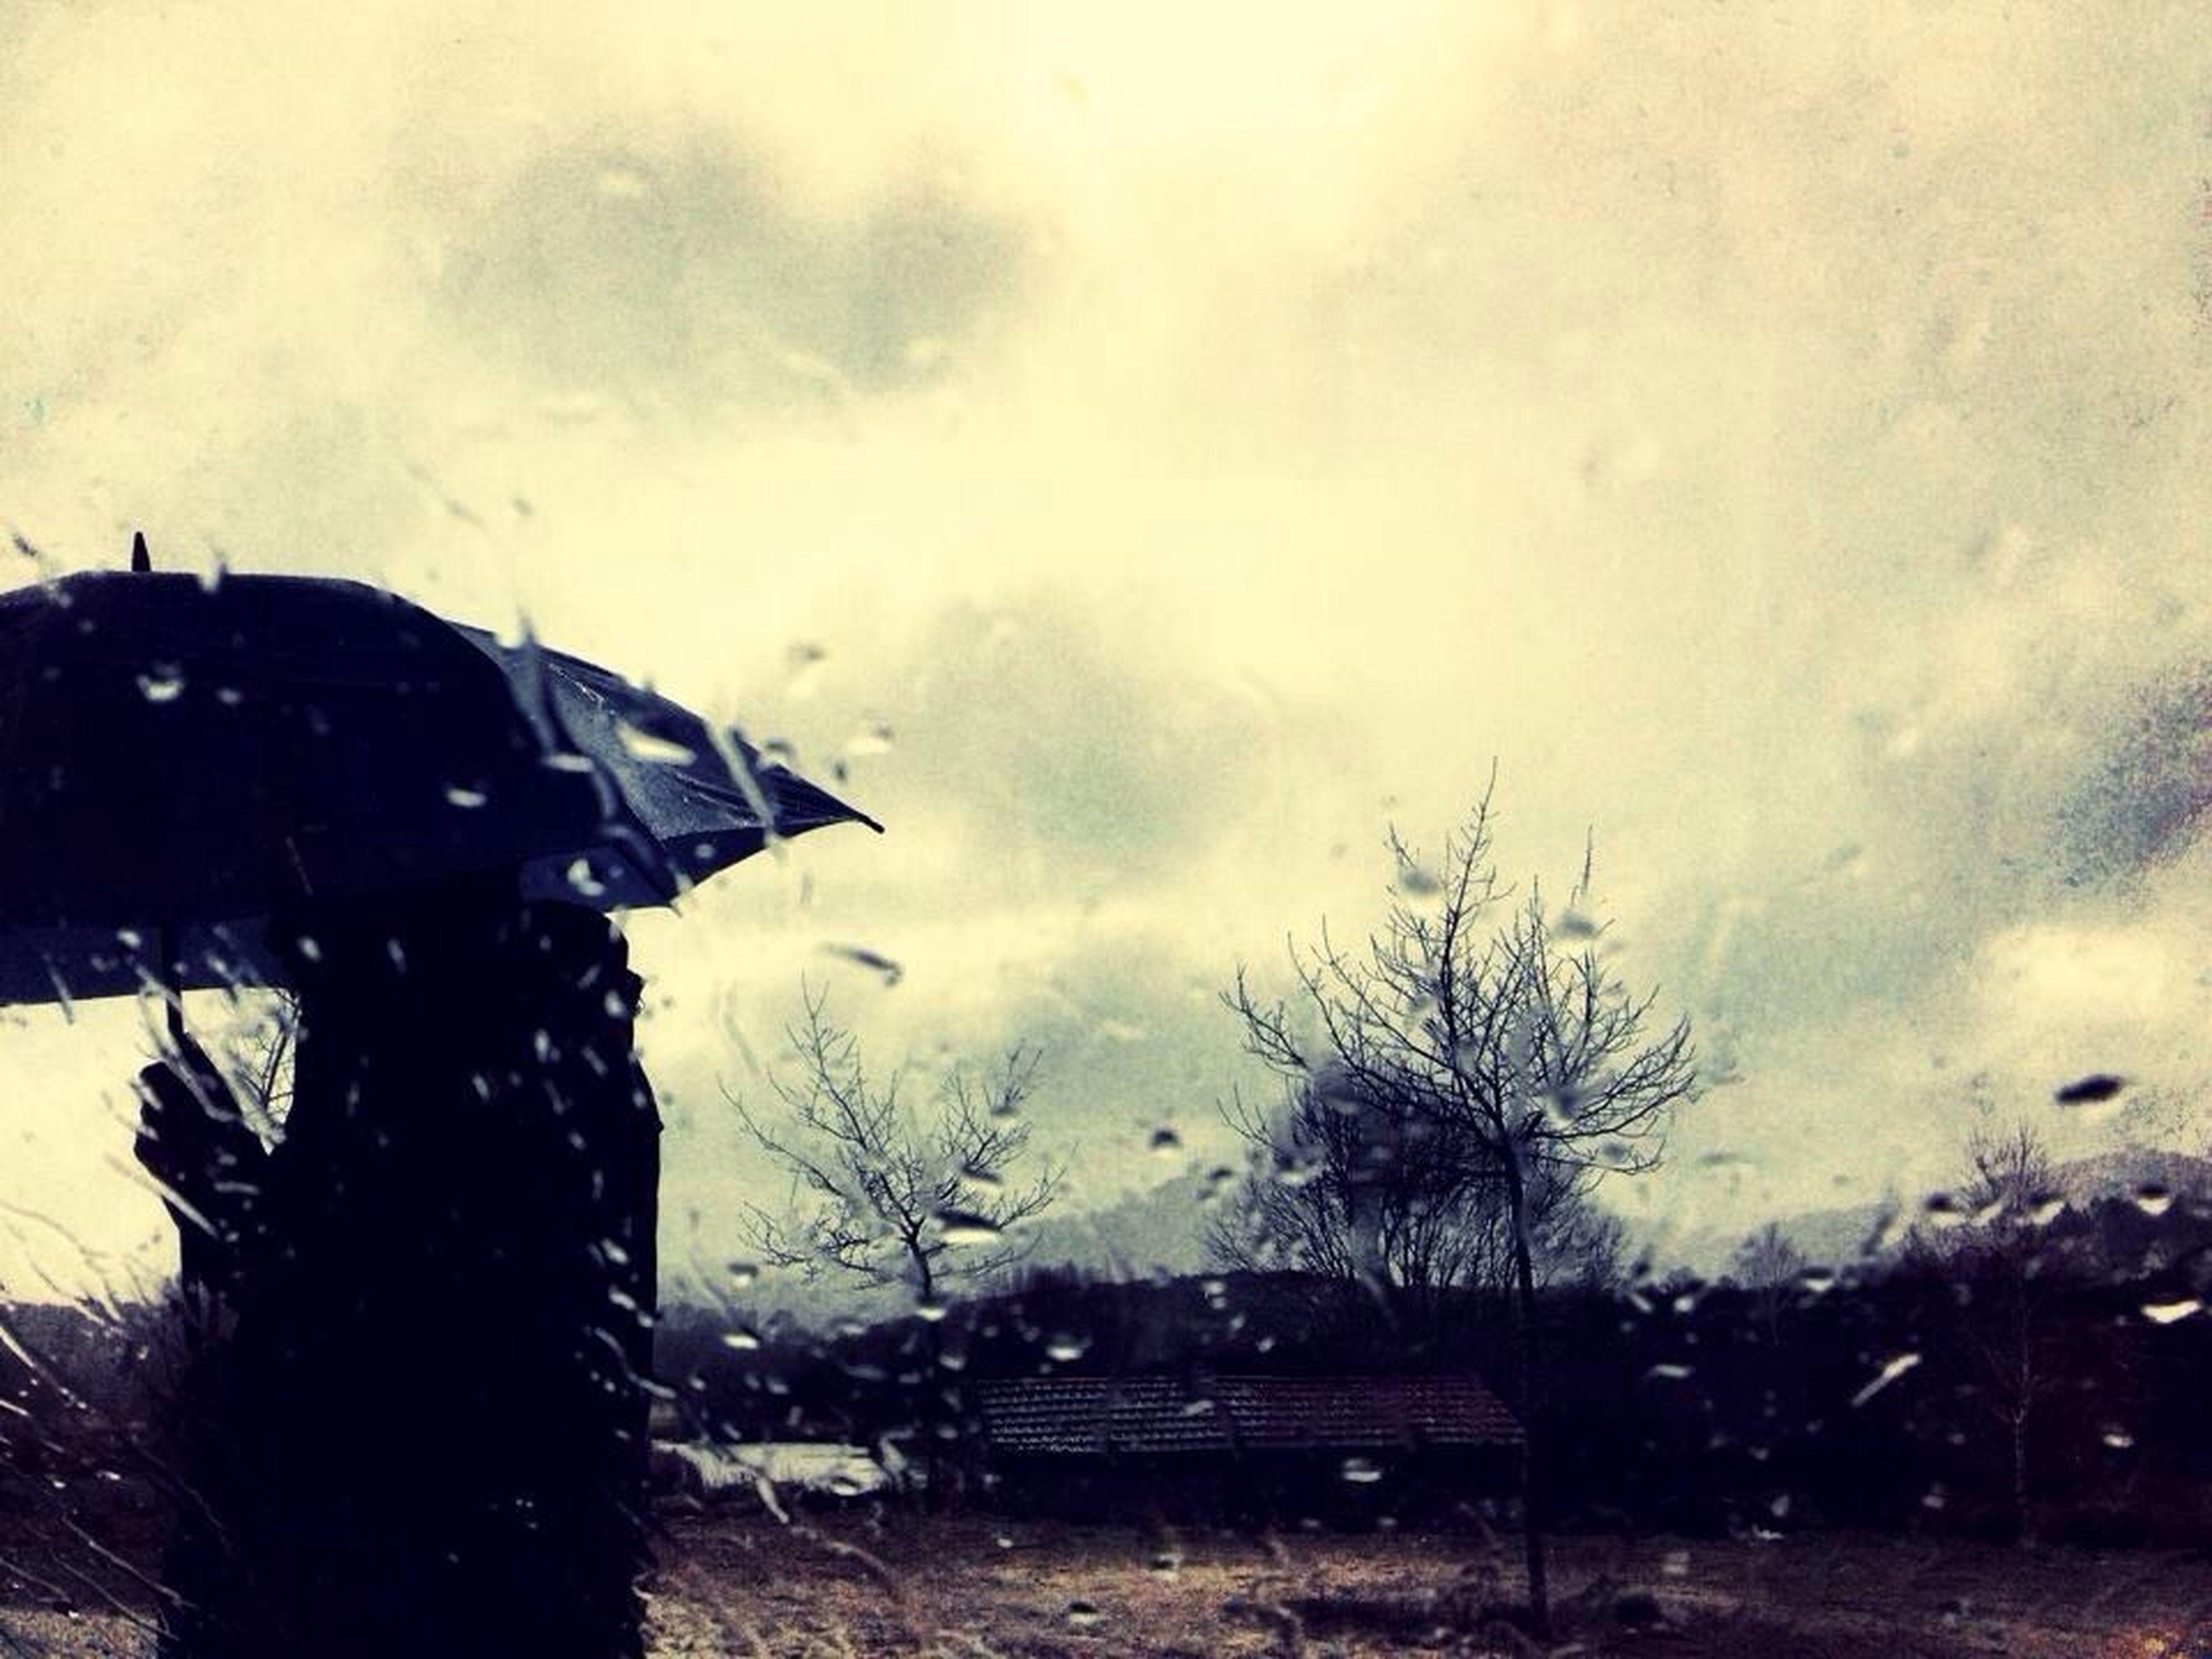 sky, wet, weather, car, transportation, window, rain, glass - material, mode of transport, land vehicle, transparent, drop, water, cloud - sky, tree, silhouette, indoors, dusk, season, cloudy